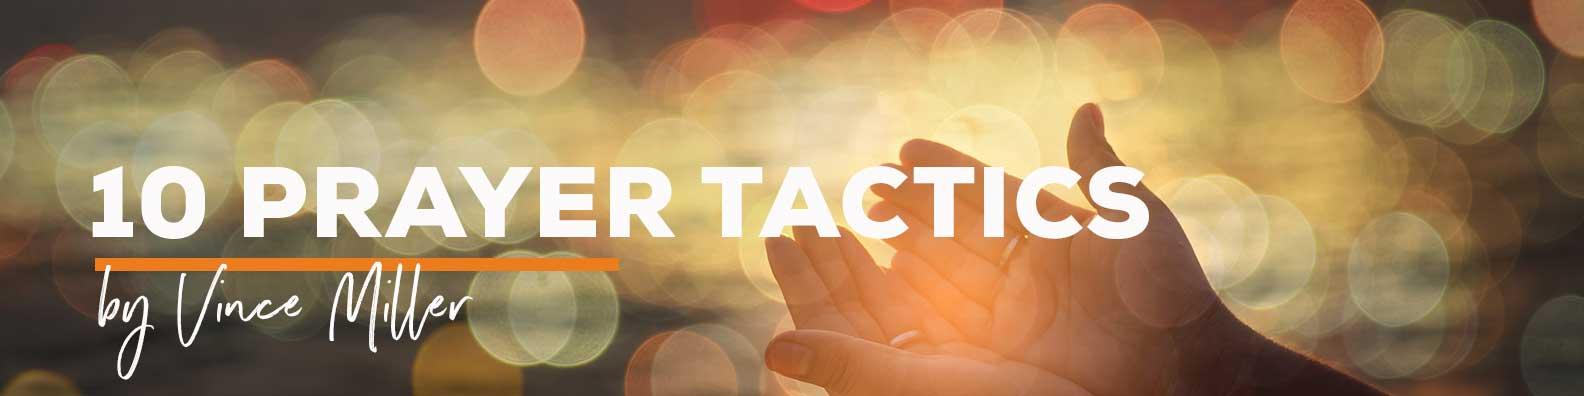 10-Prayer-Tactics-by-Vince-Miller